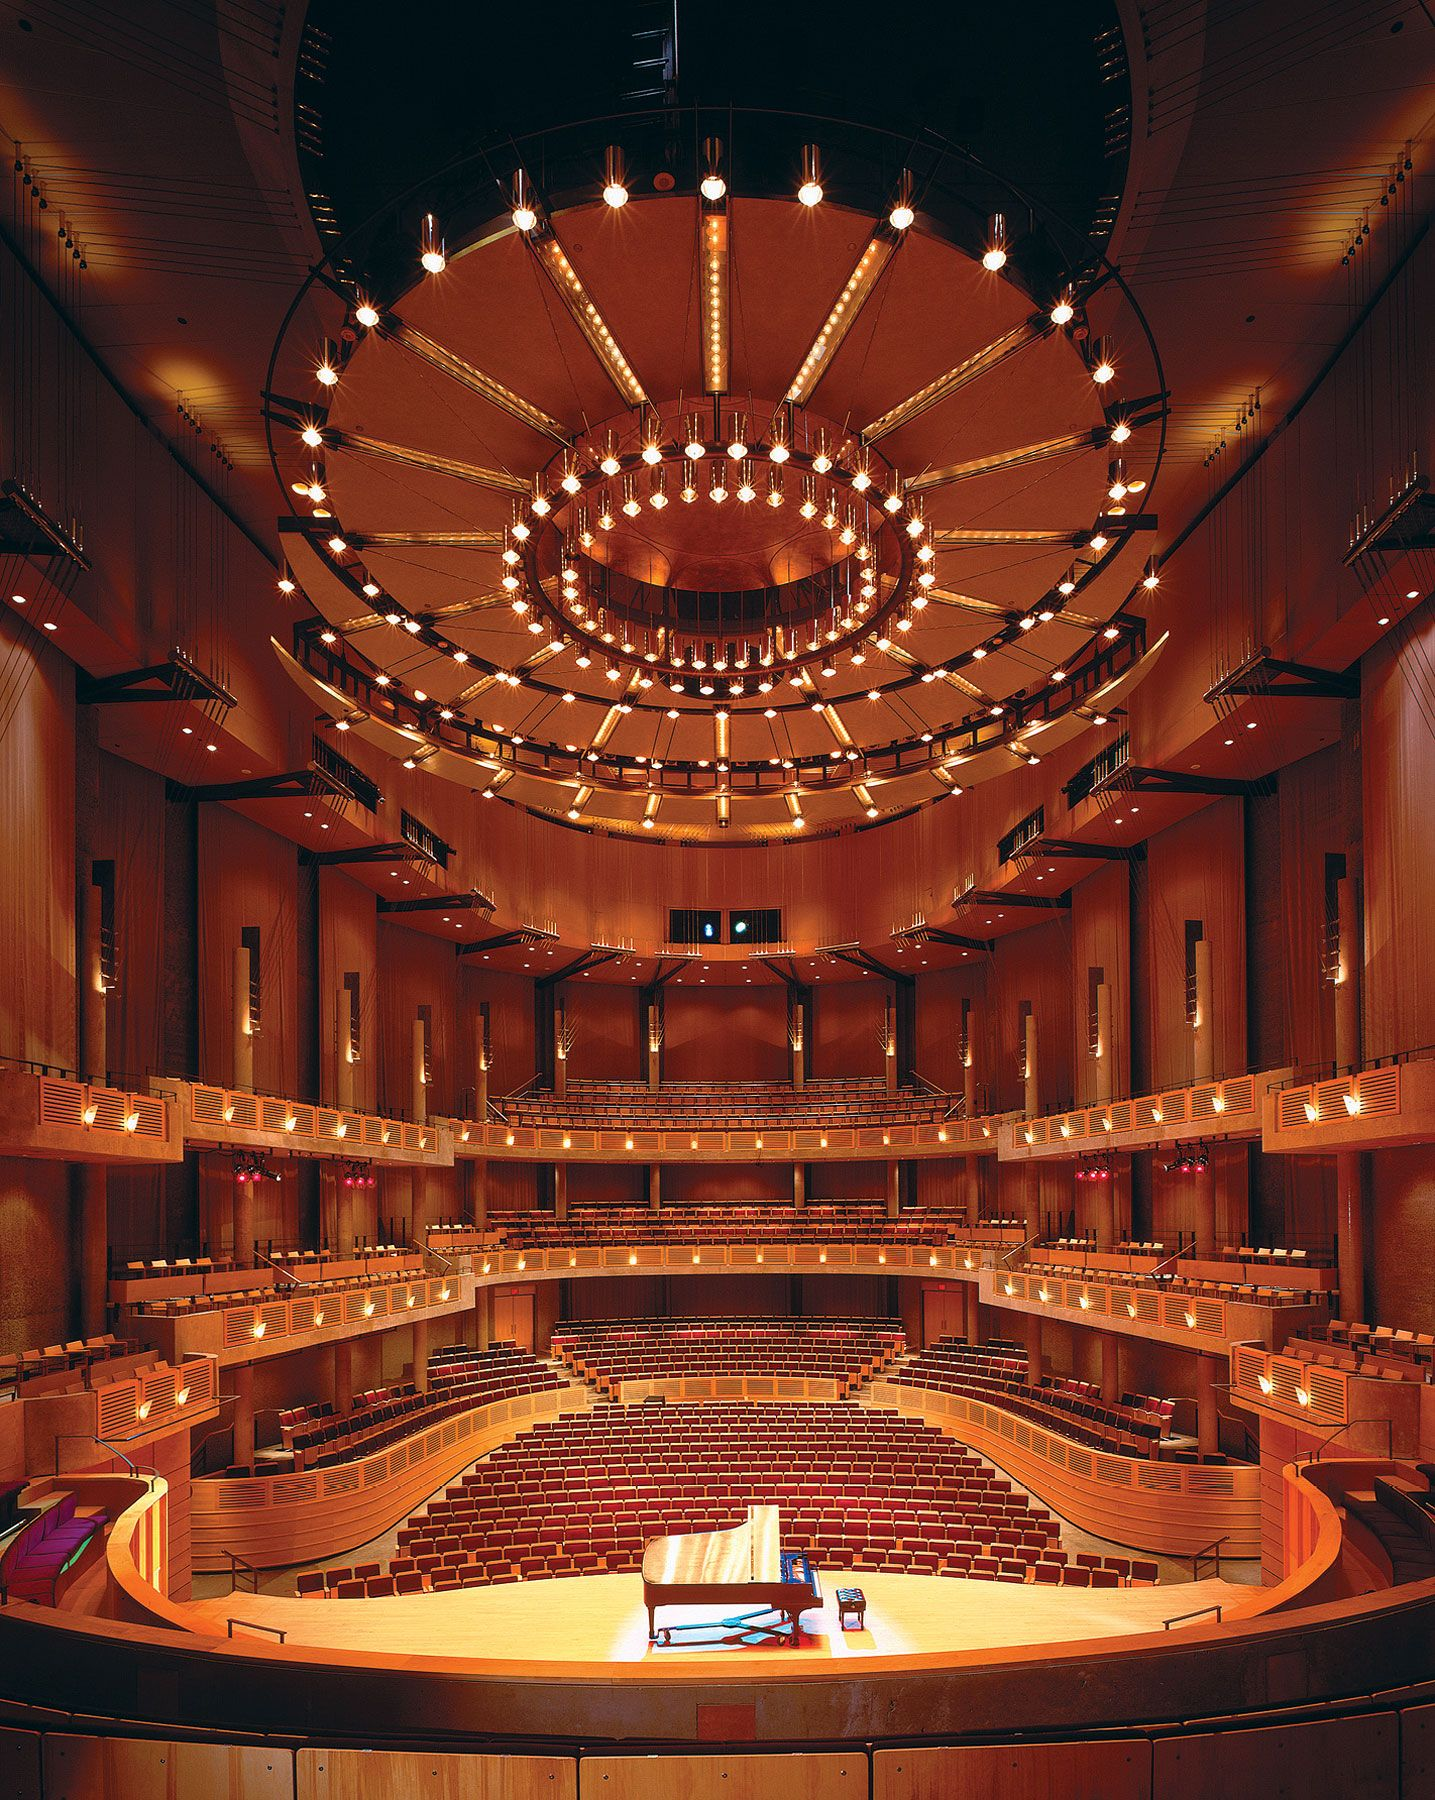 Chan Centre For The Performing Arts Vancouver Auditorium Design Auditorium Theater Performance